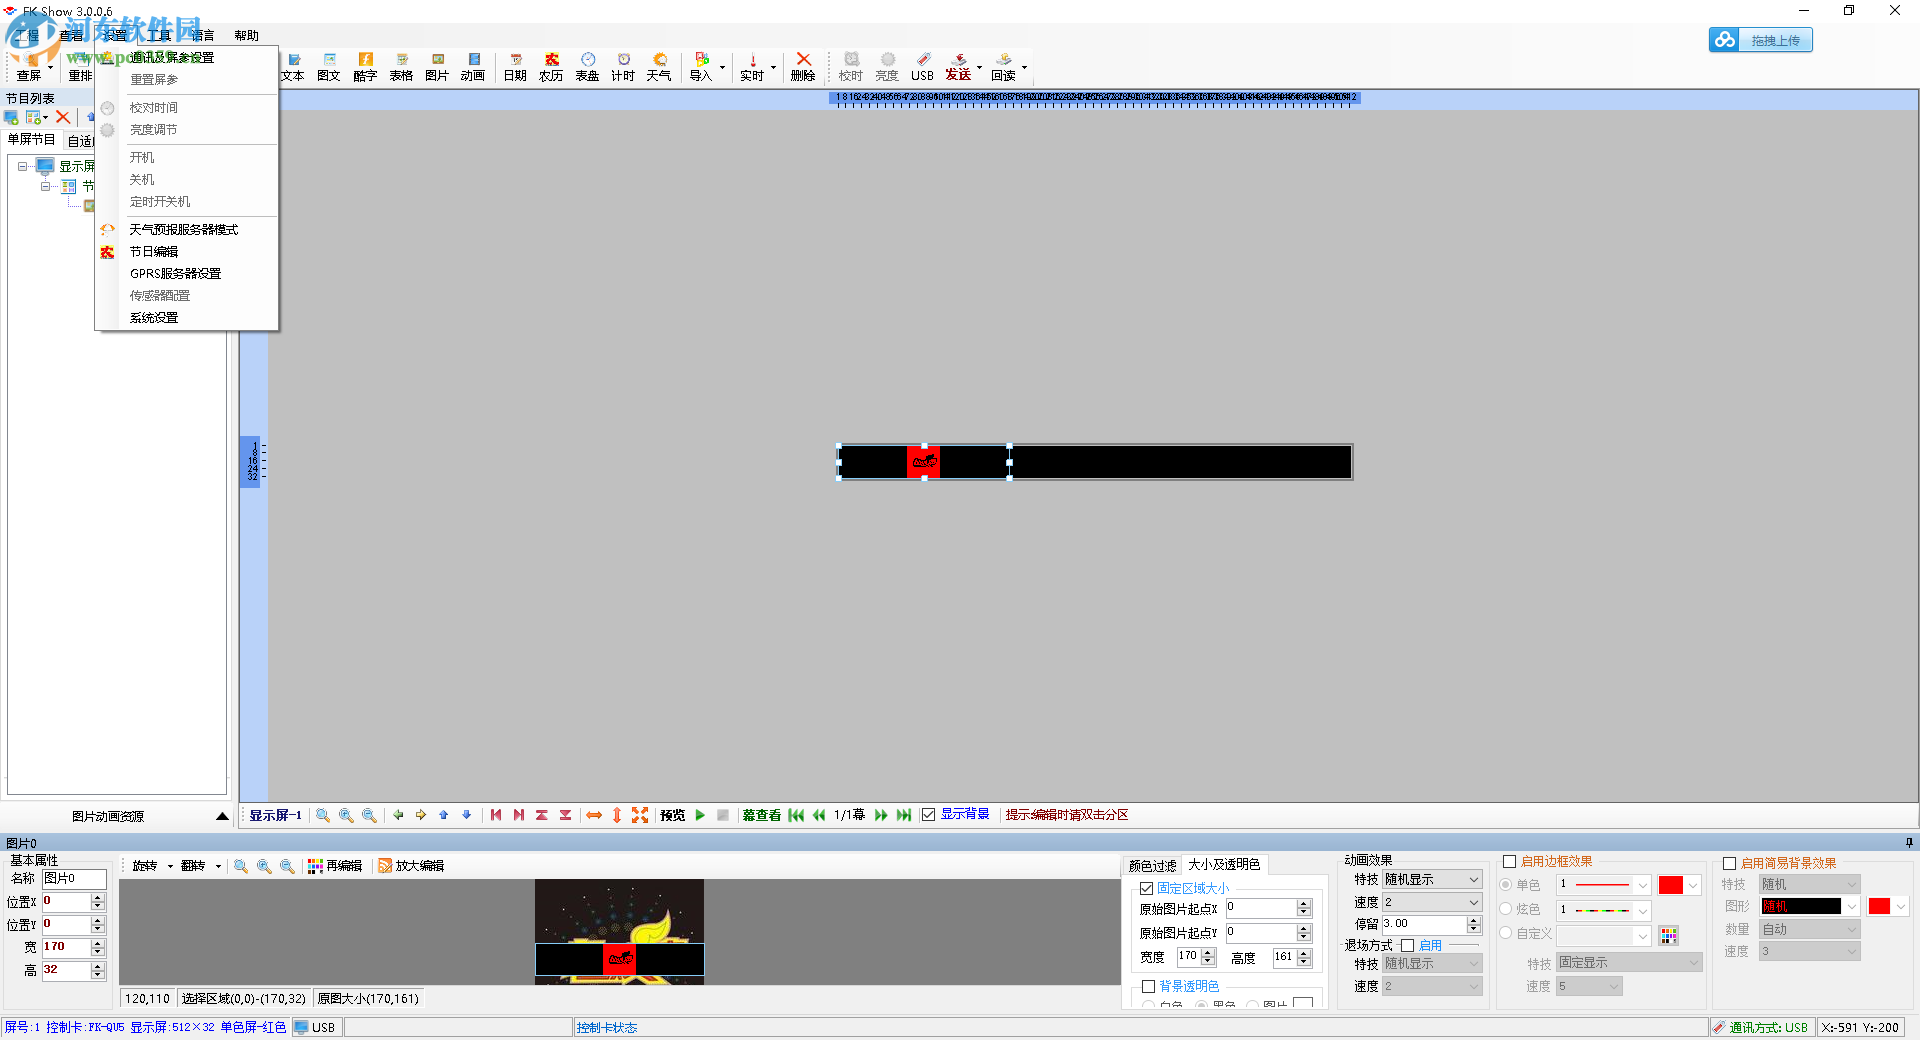 fk show软件(led显示屏软件编辑工具) 3.0.0.7 官方版